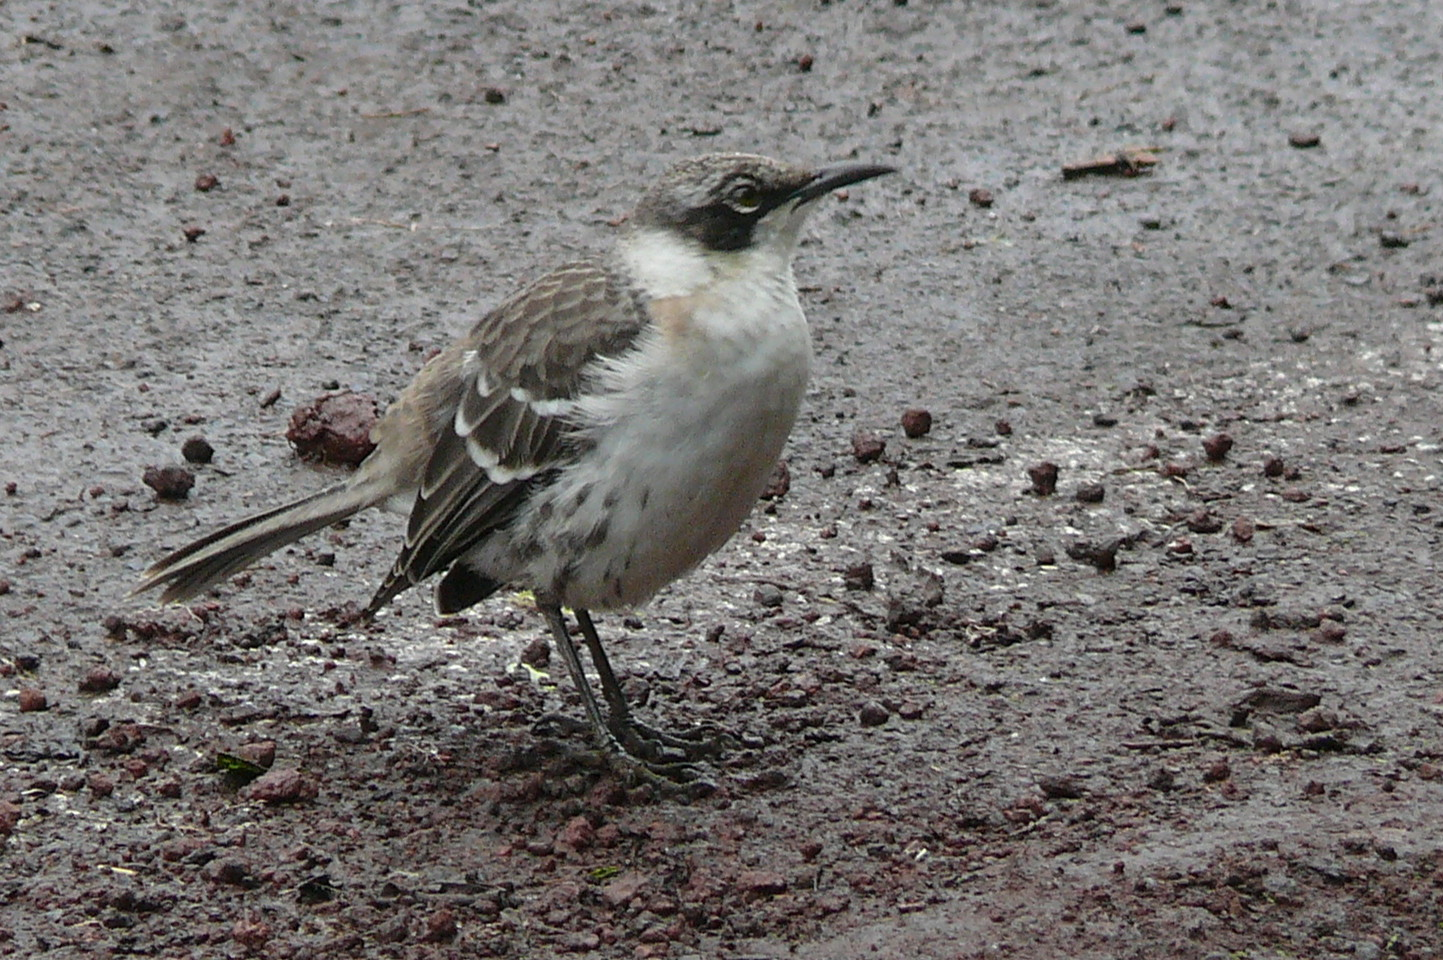 Nesomimus parvulus, Foto: datuopinion.com